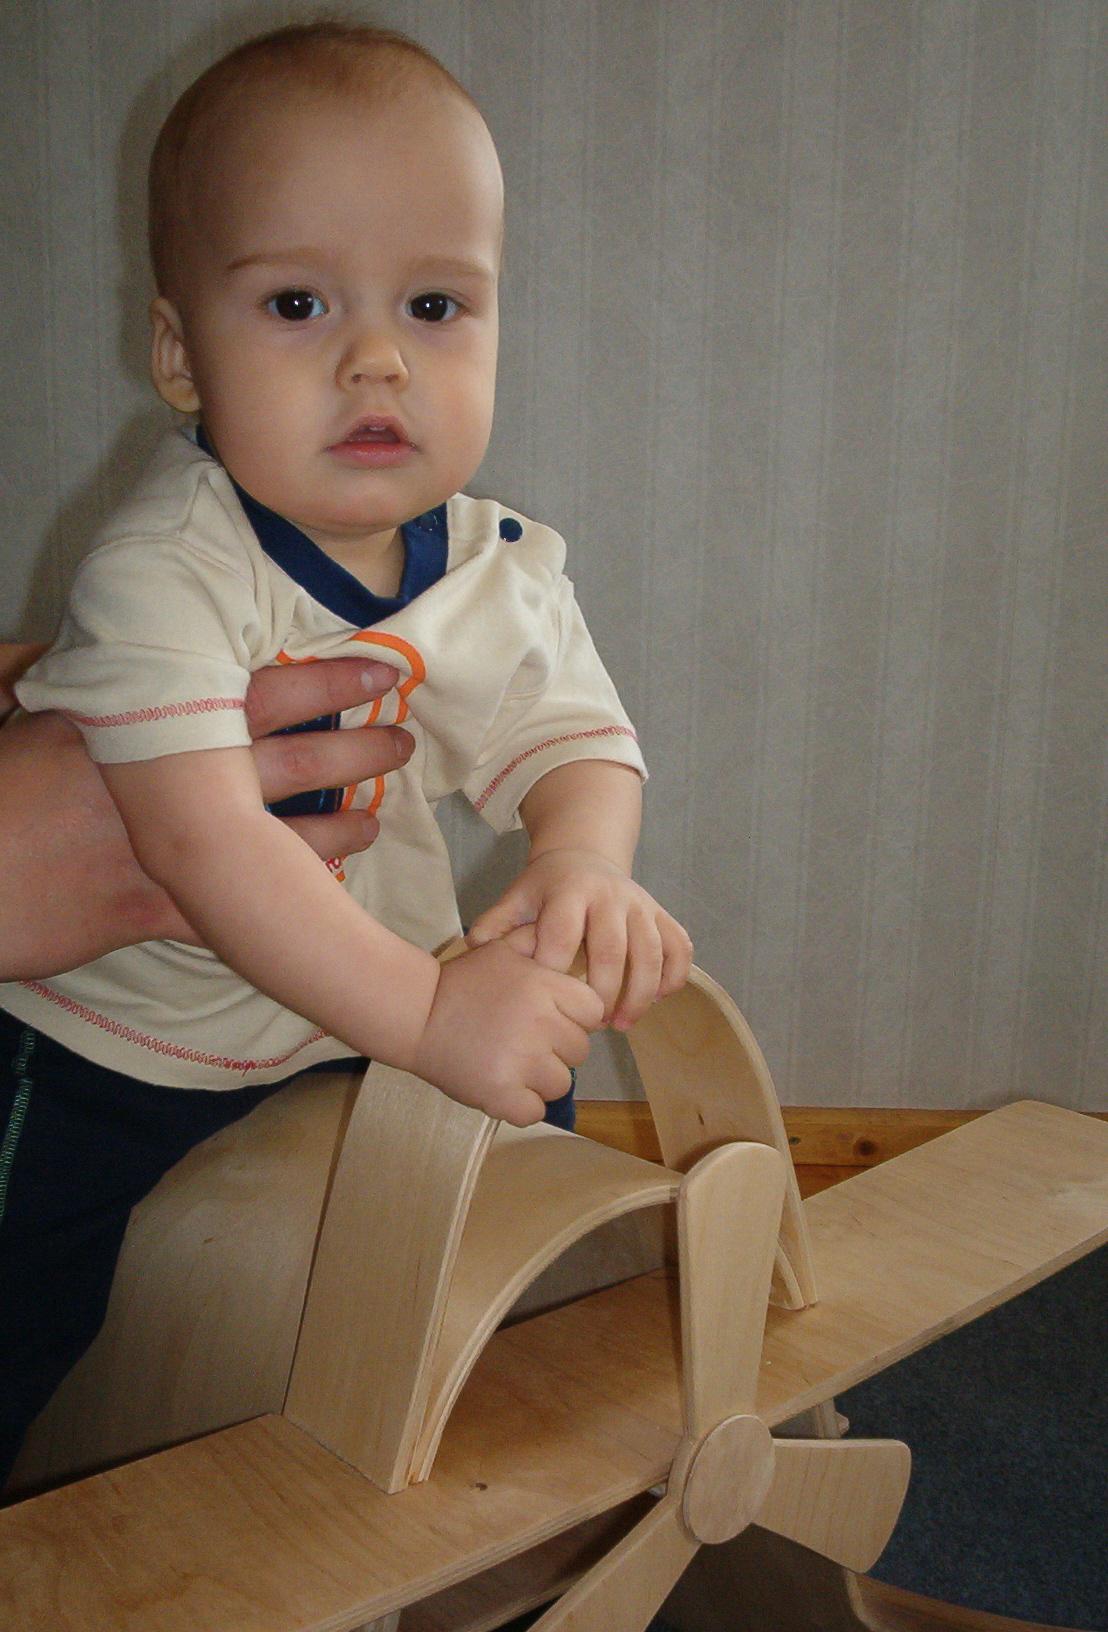 child sitting on a toy plane